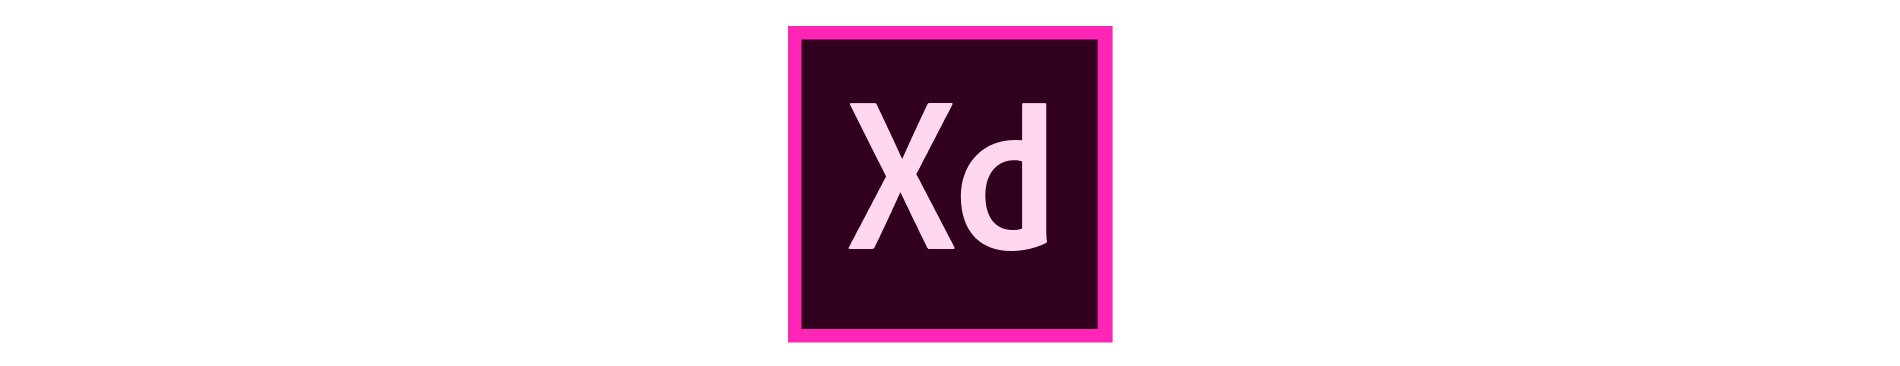 xd.png